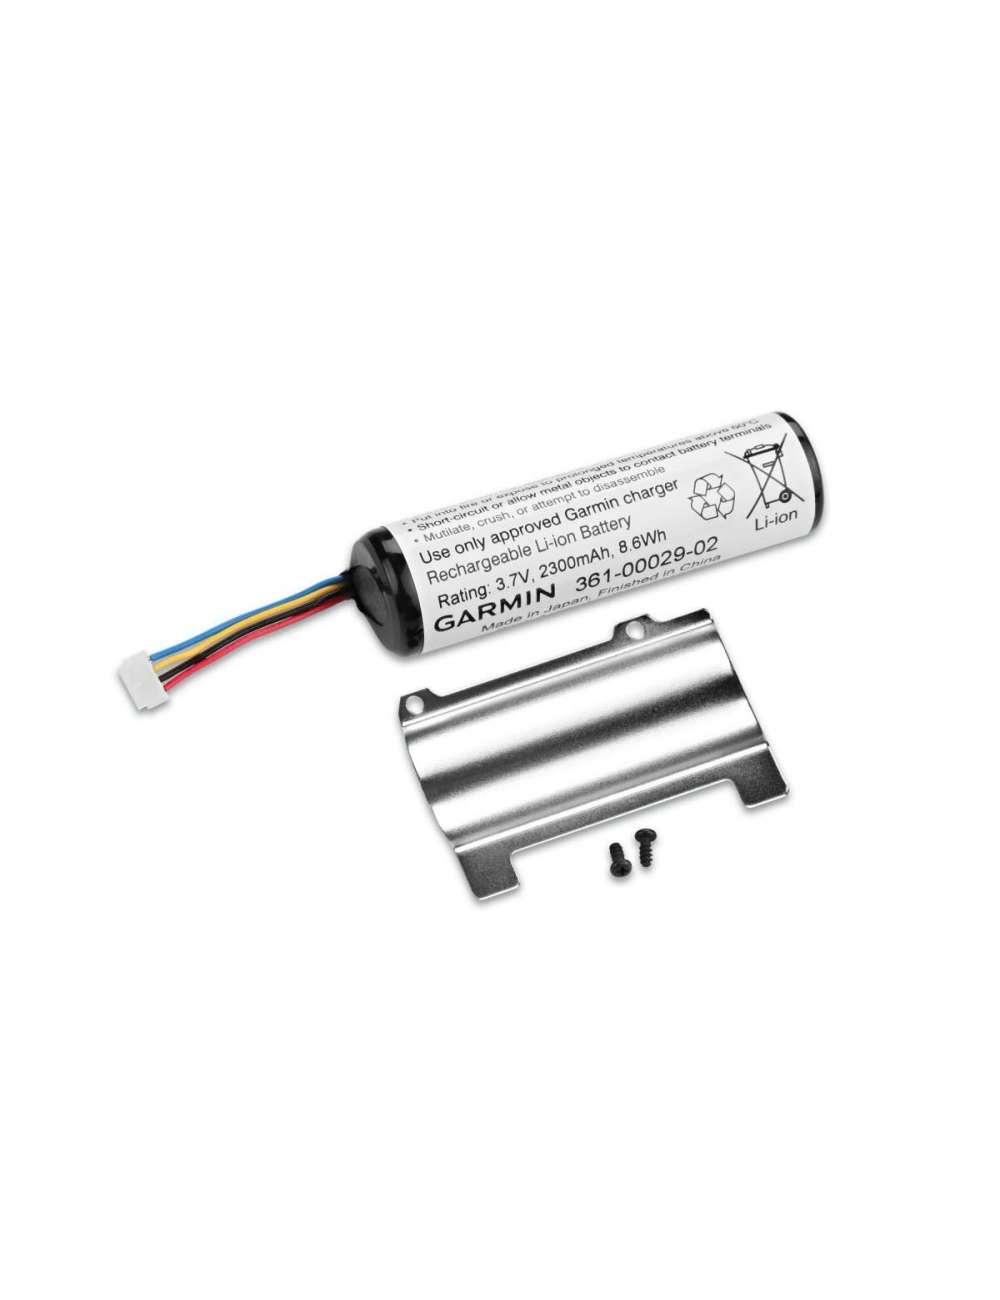 garmin batterie DC50